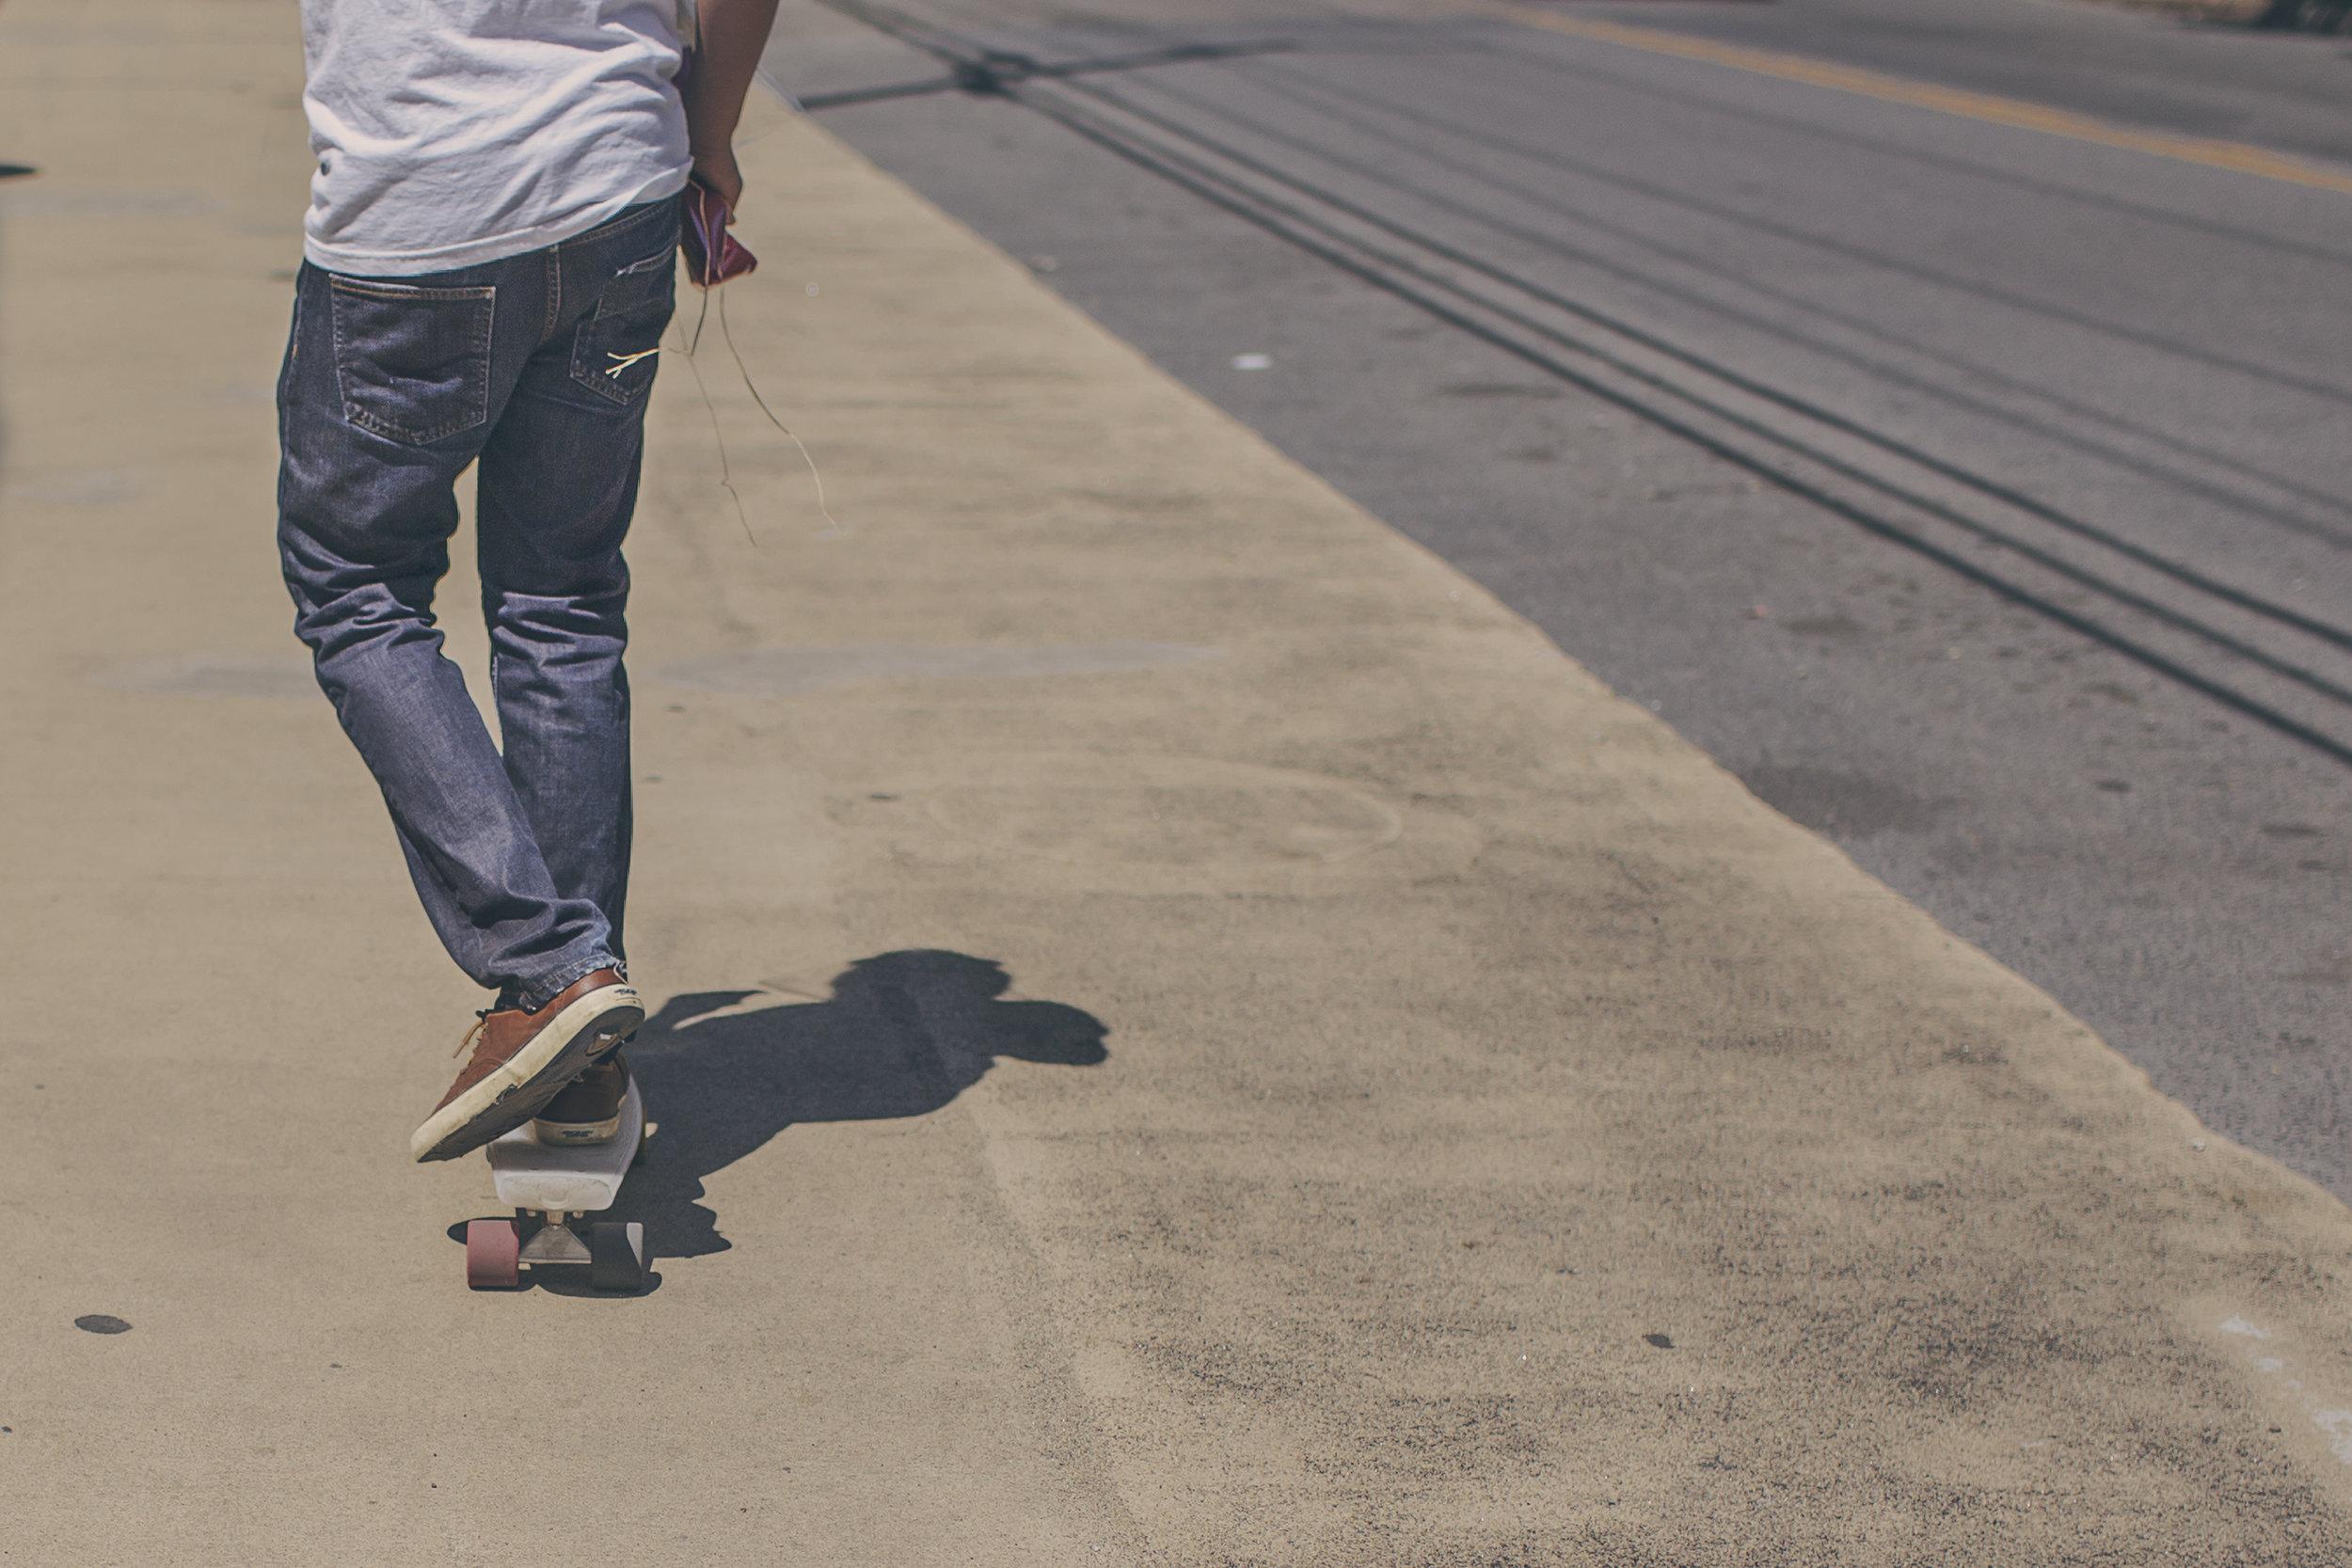 man-person-street-sidewalk.jpg